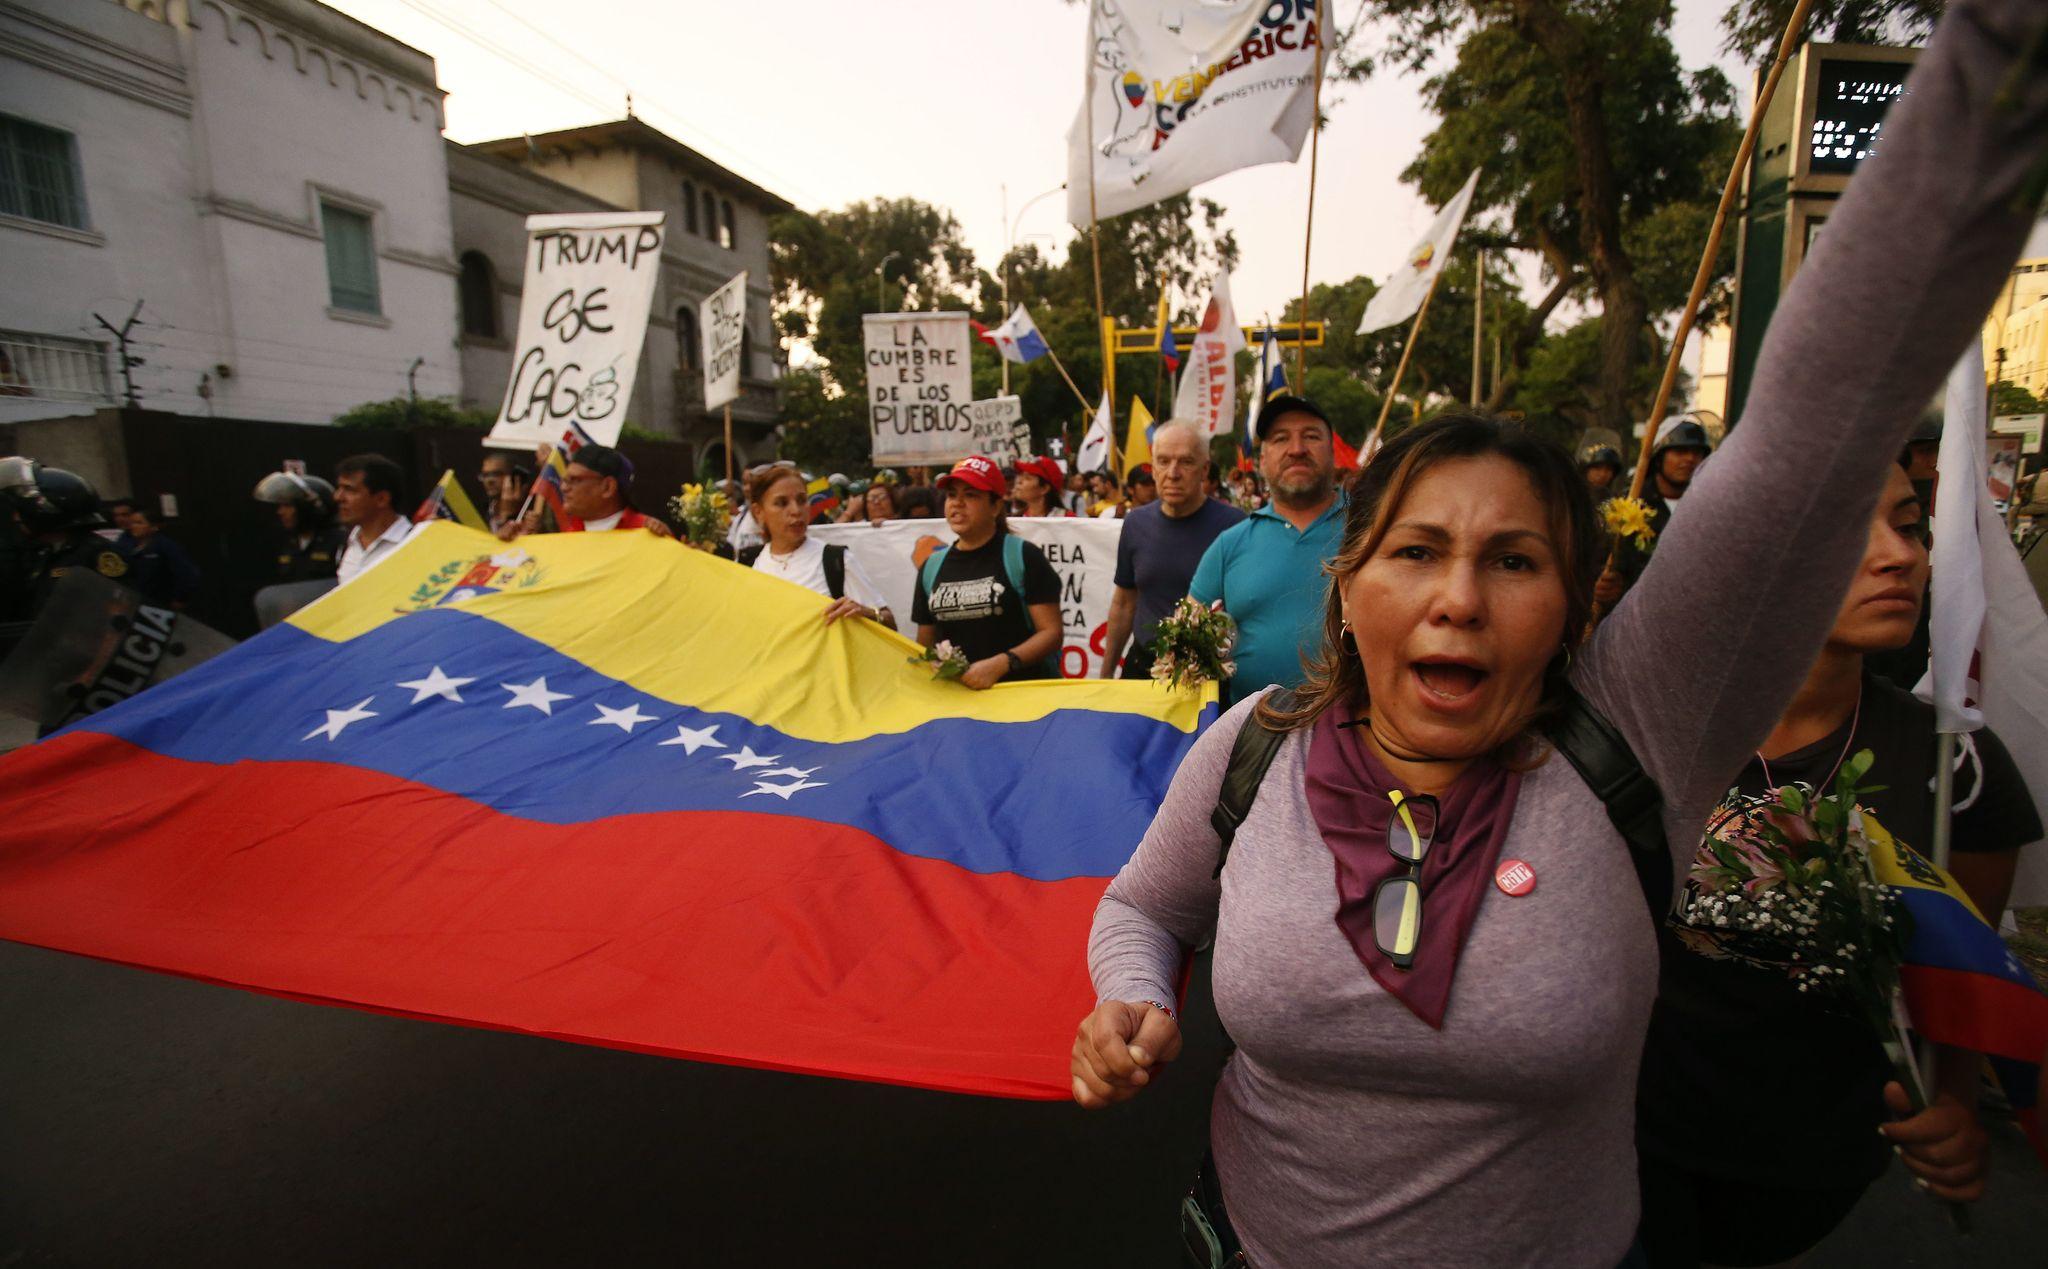 Venezuela collapse creates immigration wave in South America - Washington Times